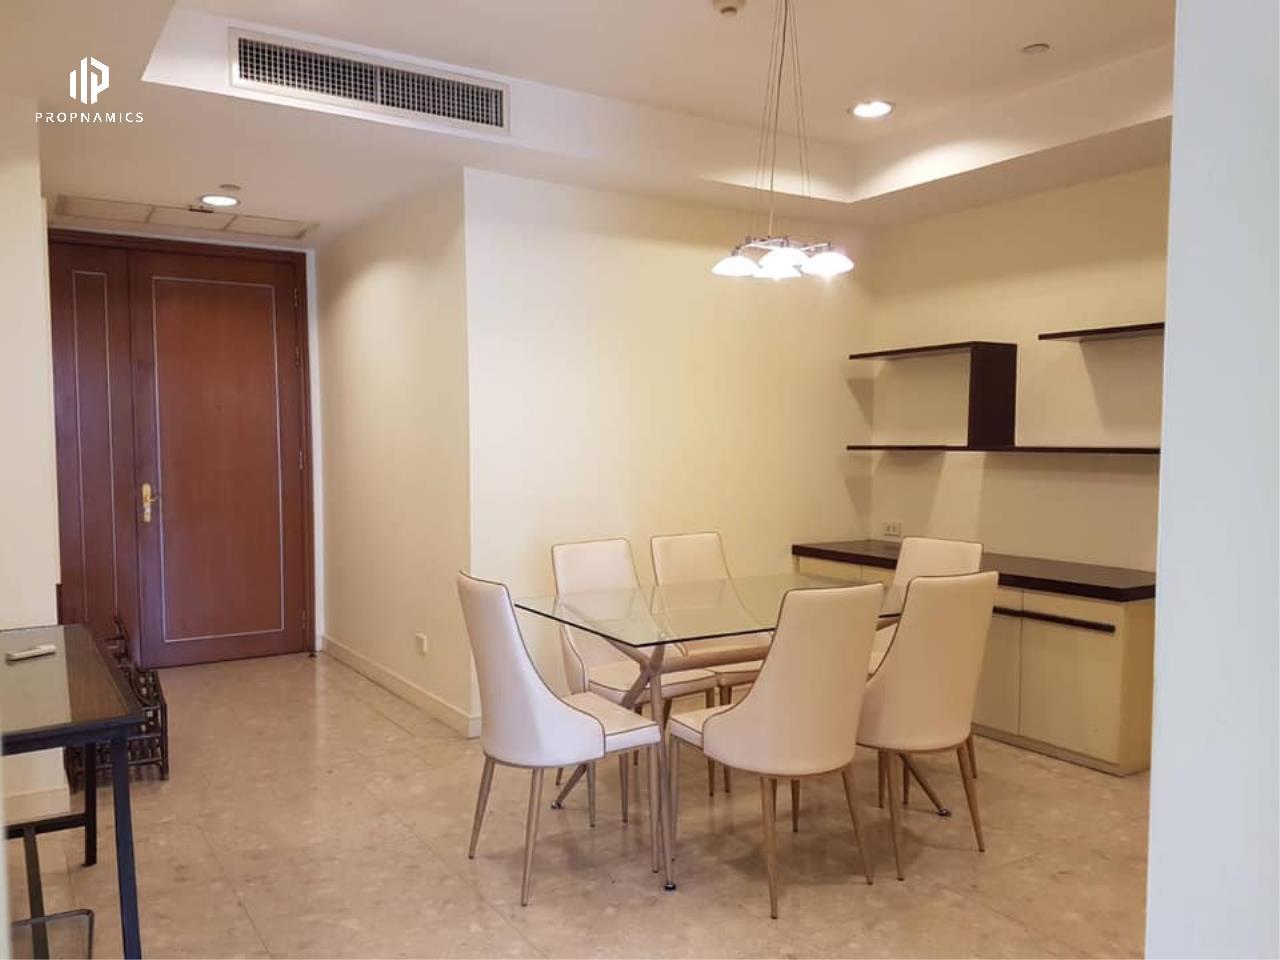 Propnamics Co., Ltd Agency's Hampton Condominium Thonglor 10 11